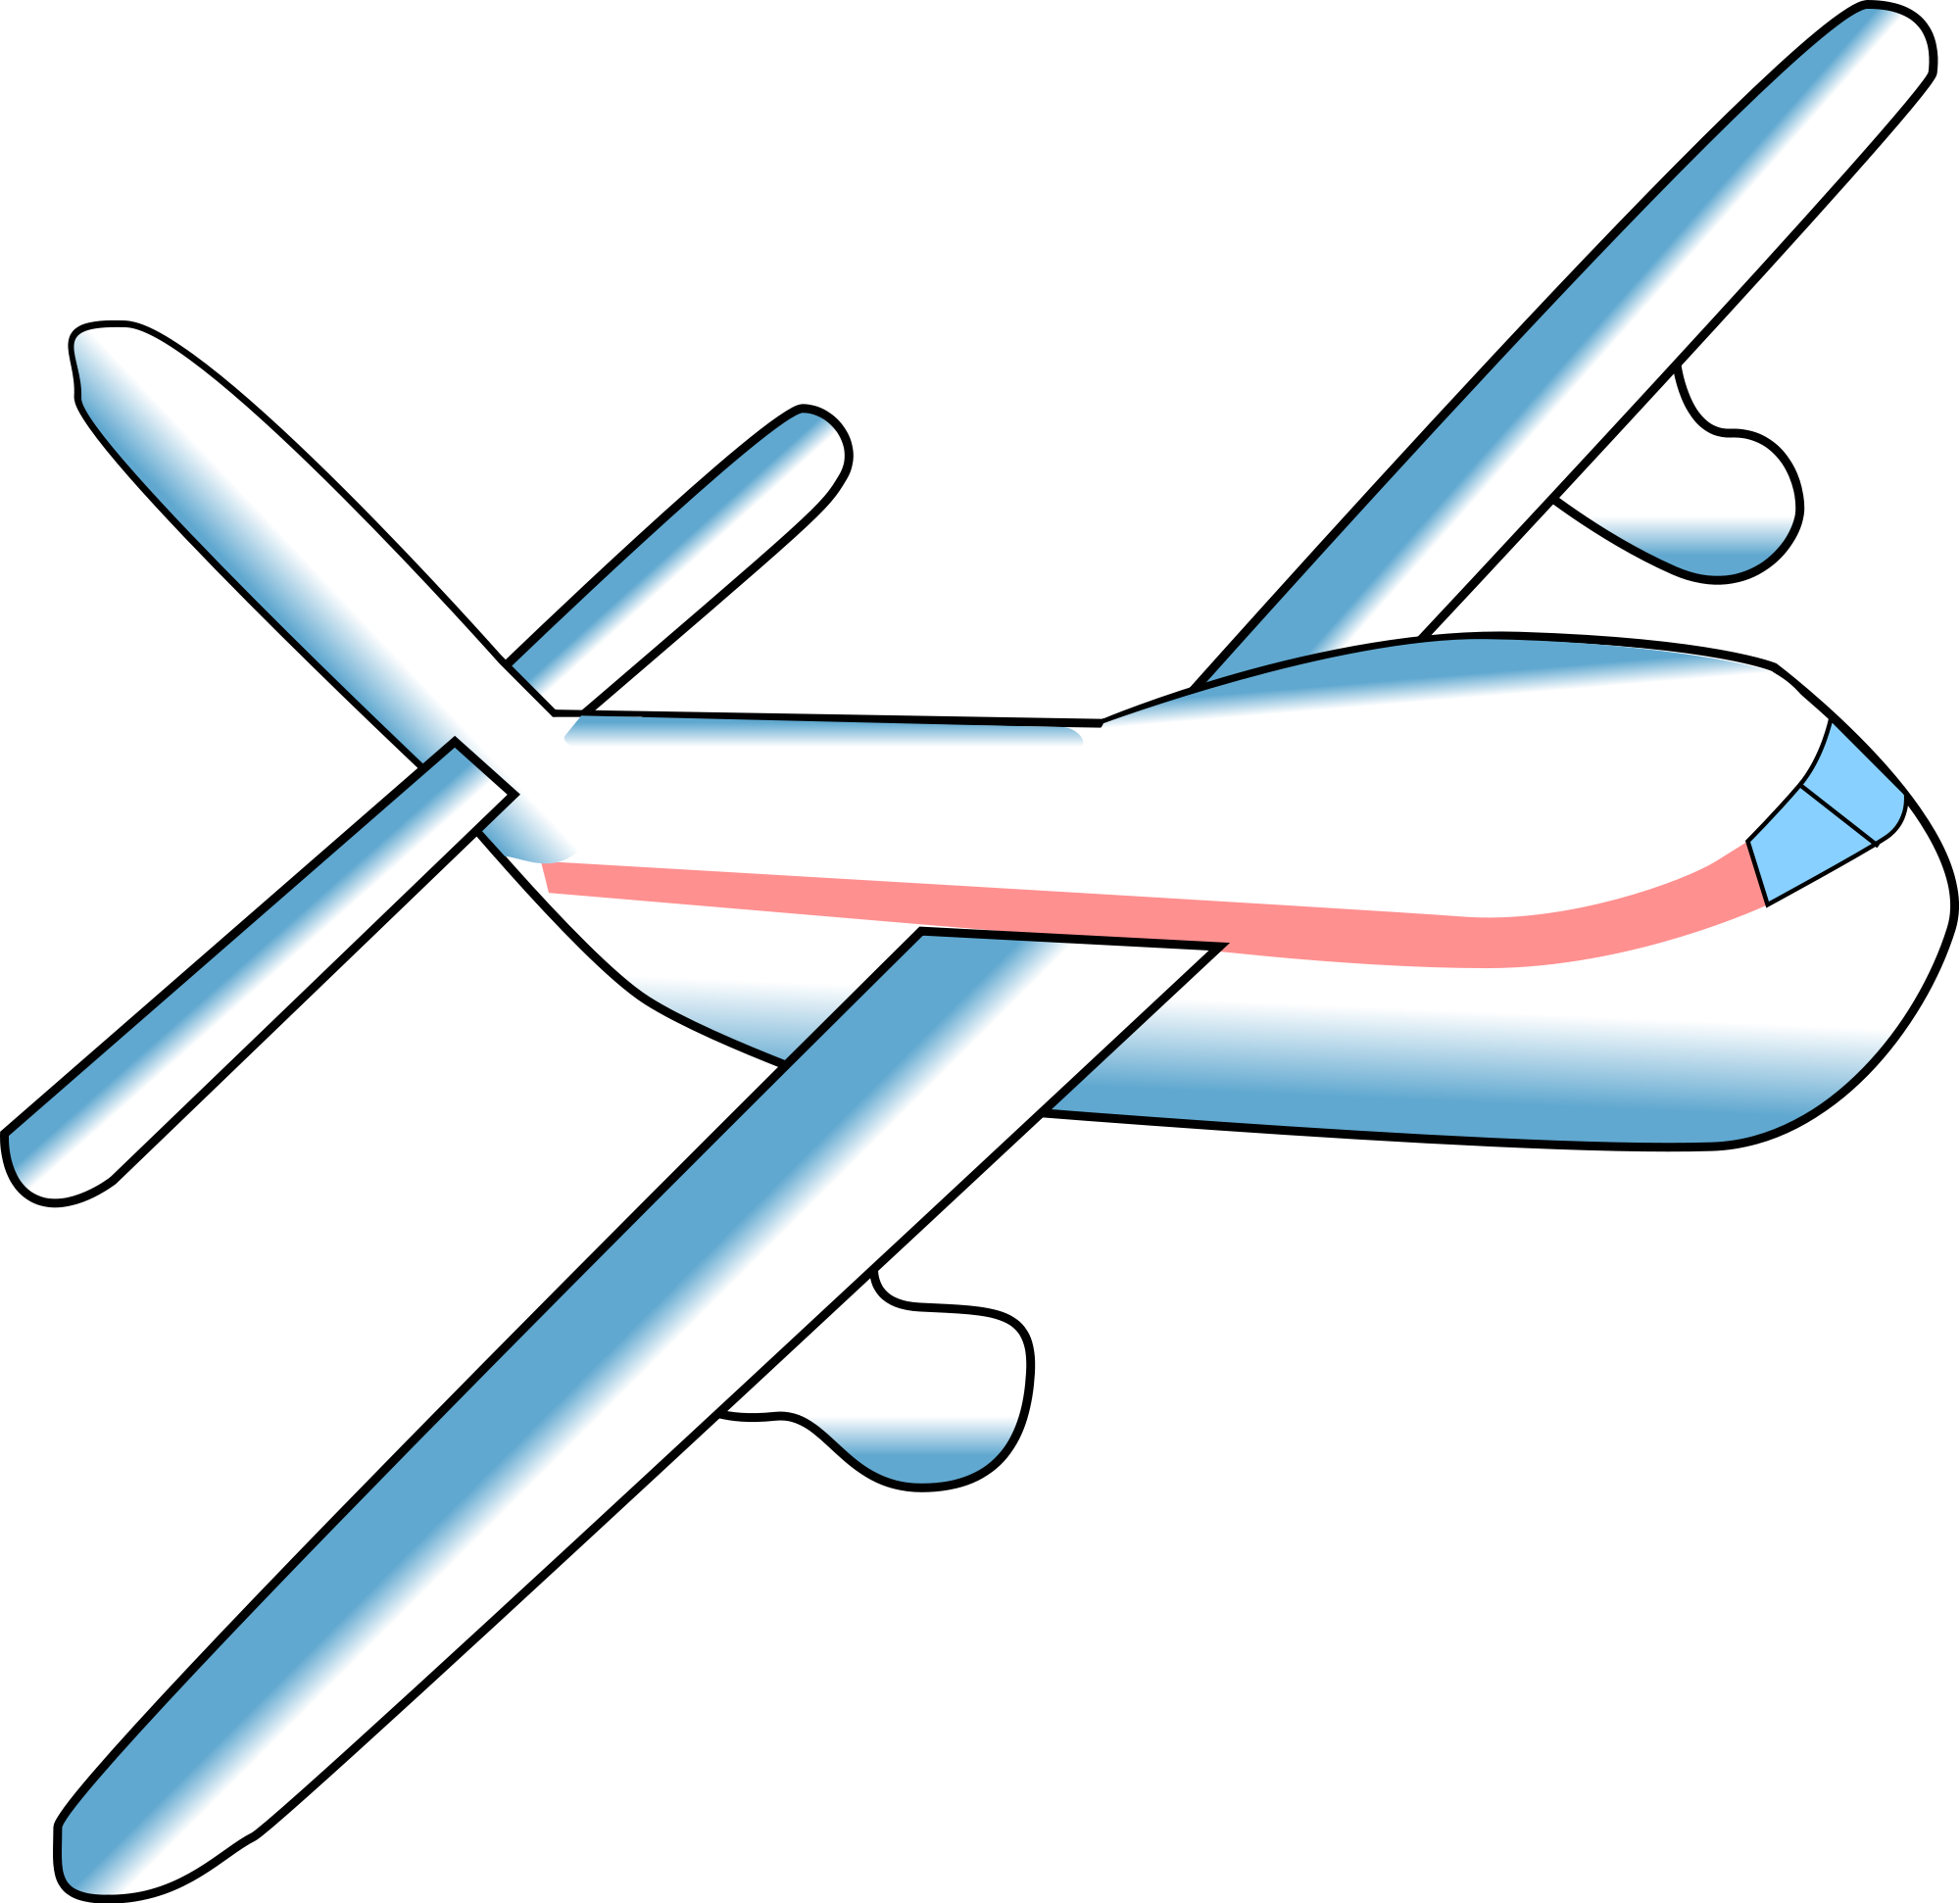 Wing clipart flight attendant. File airplane svg wikimedia